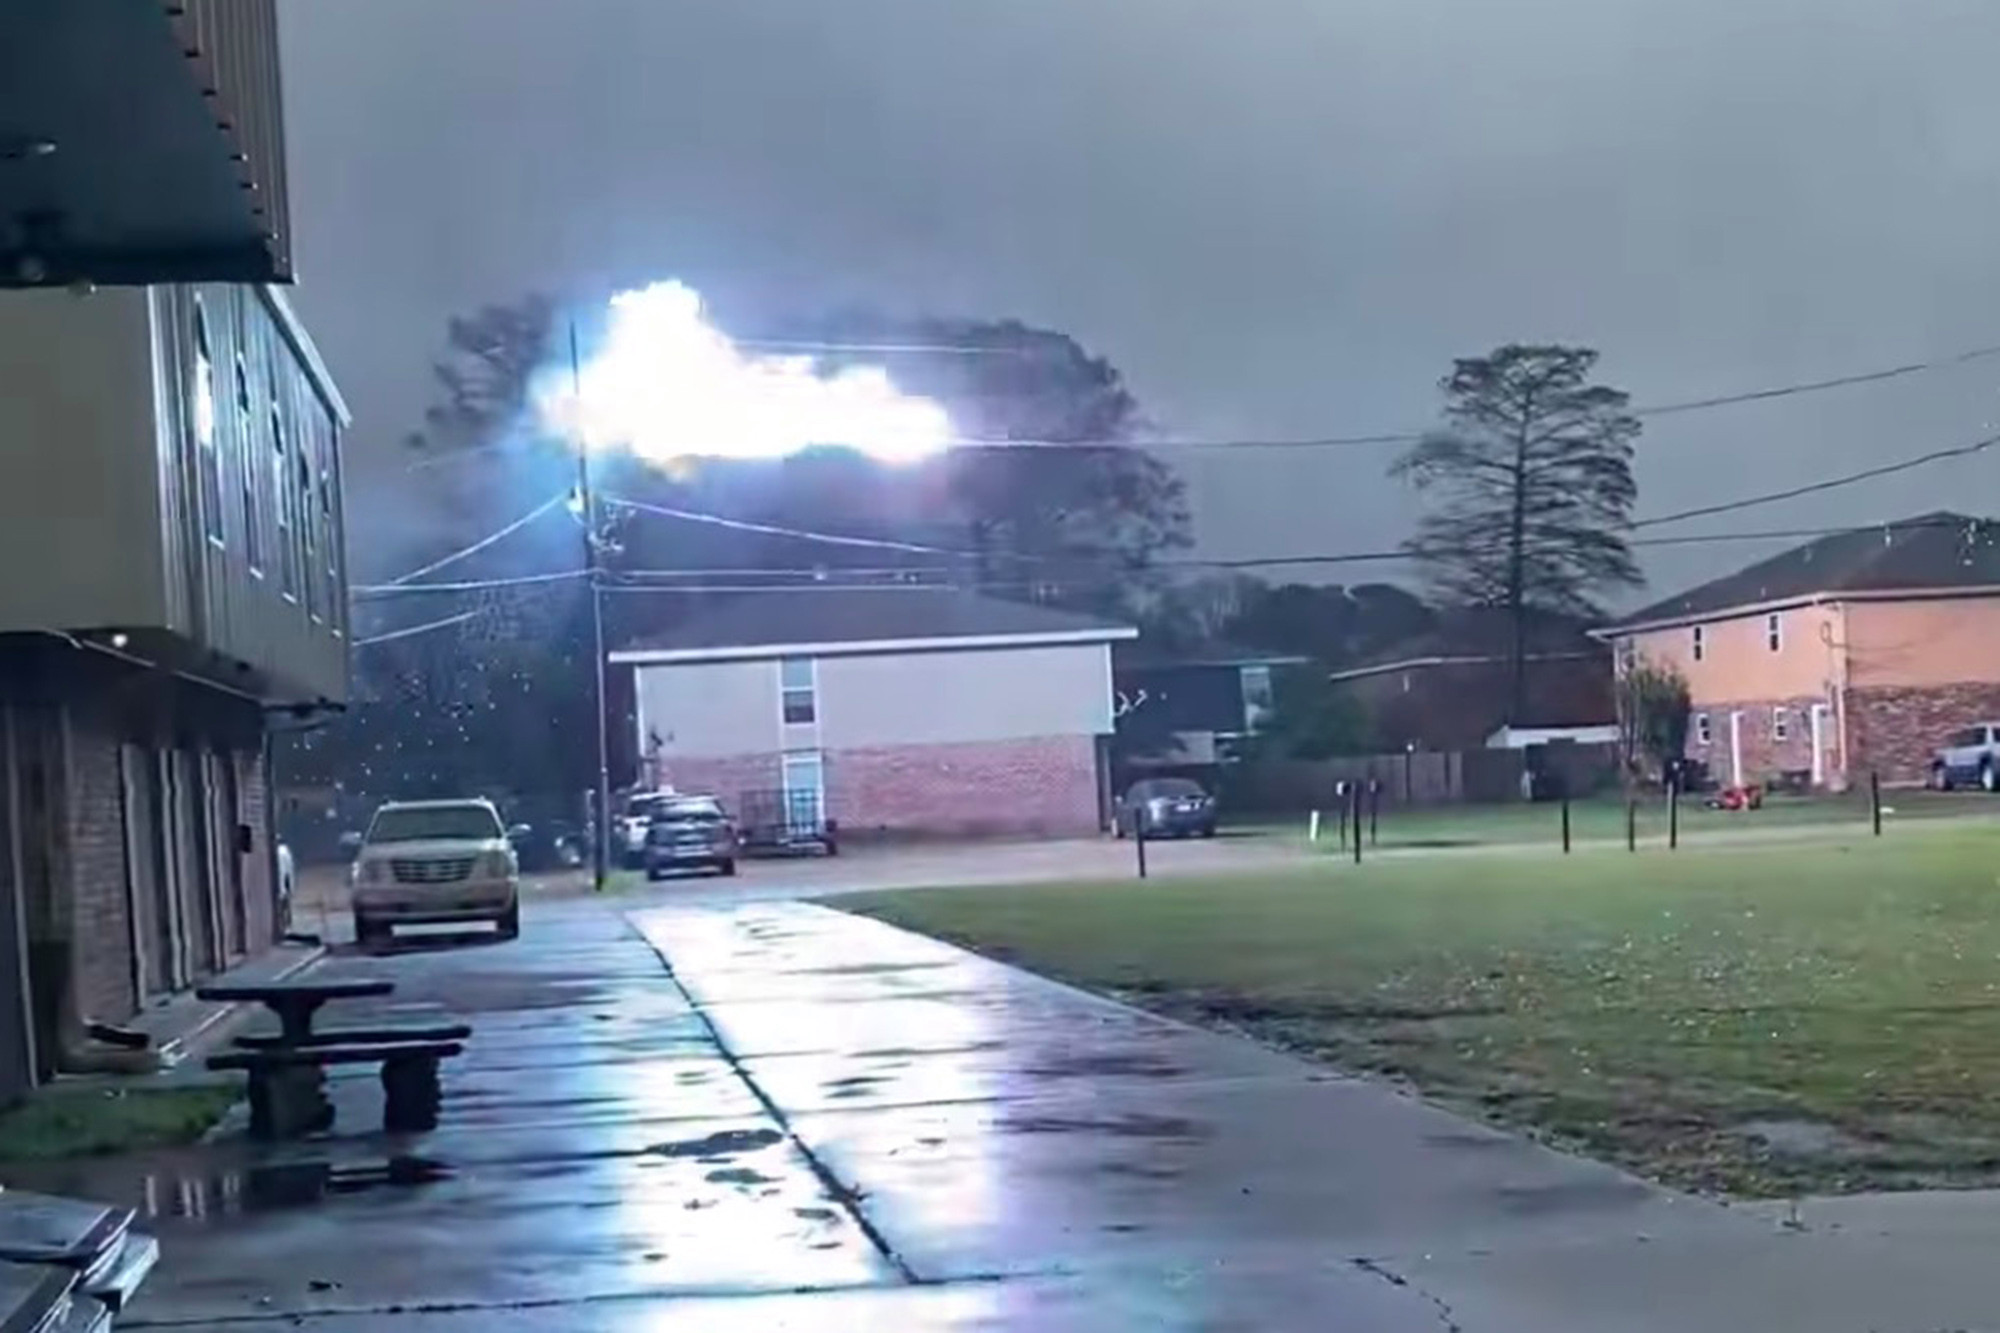 Shocking footage shows fireballs zipping along frozen power line